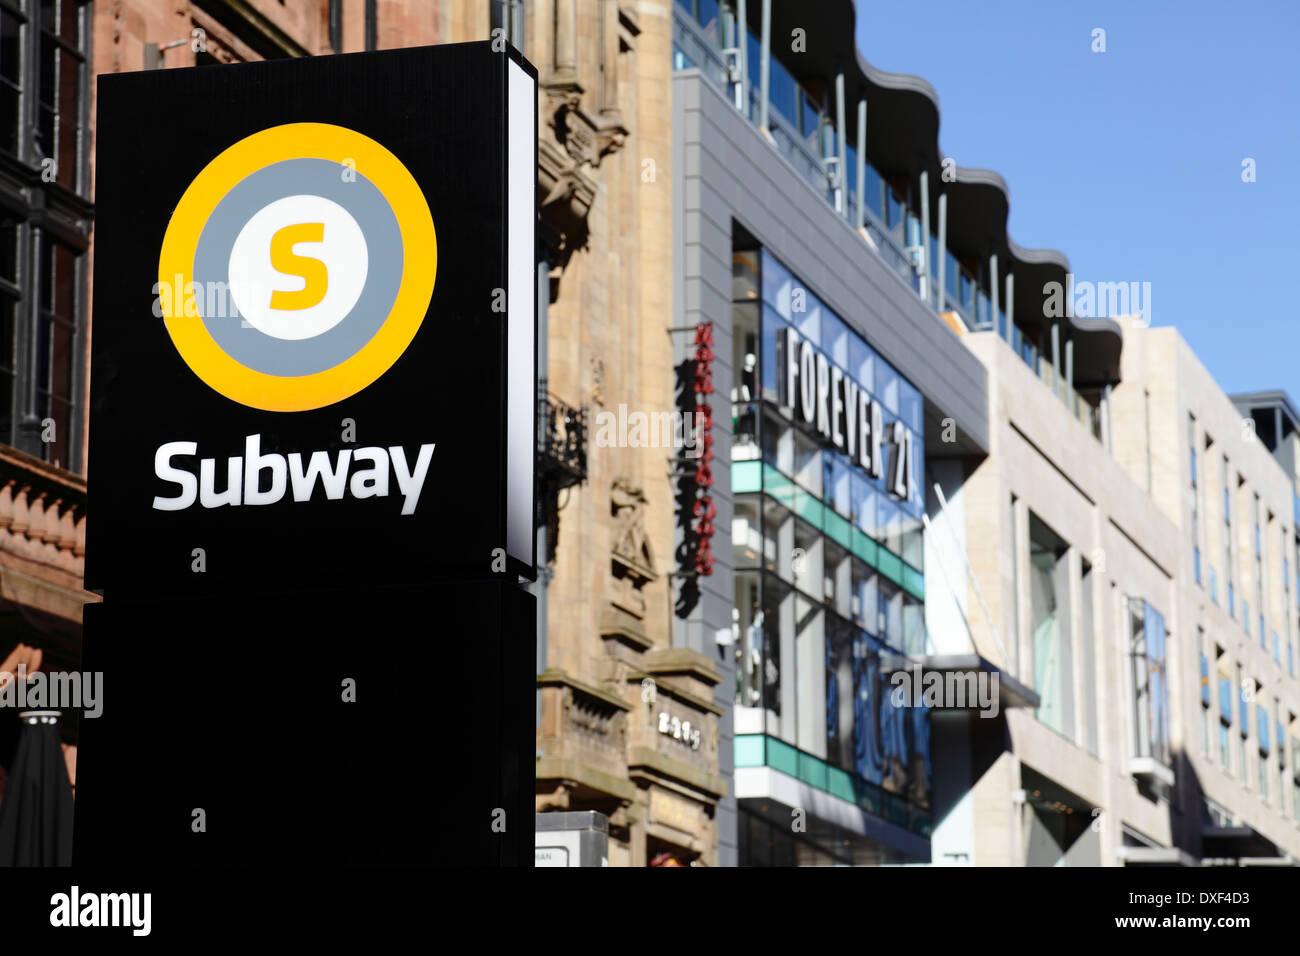 A subway (underground) station sign in Glasgow city centre, Scotland, UK - Stock Image